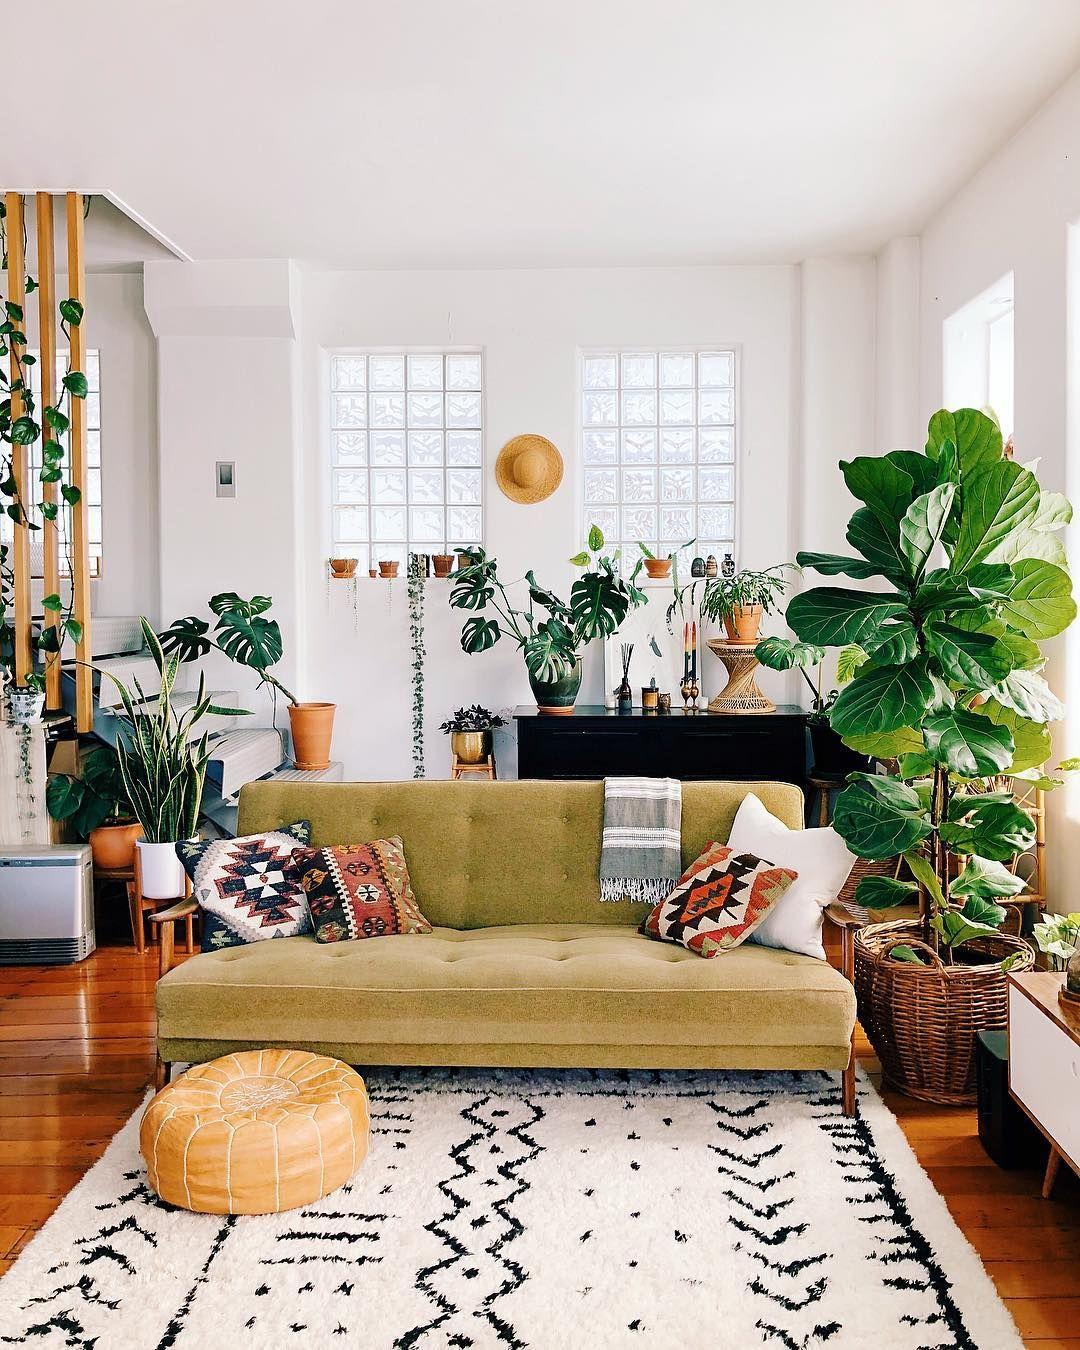 The Green Makes It Look So Fresh Living Room Designs Room Inspiration Boho Living Room